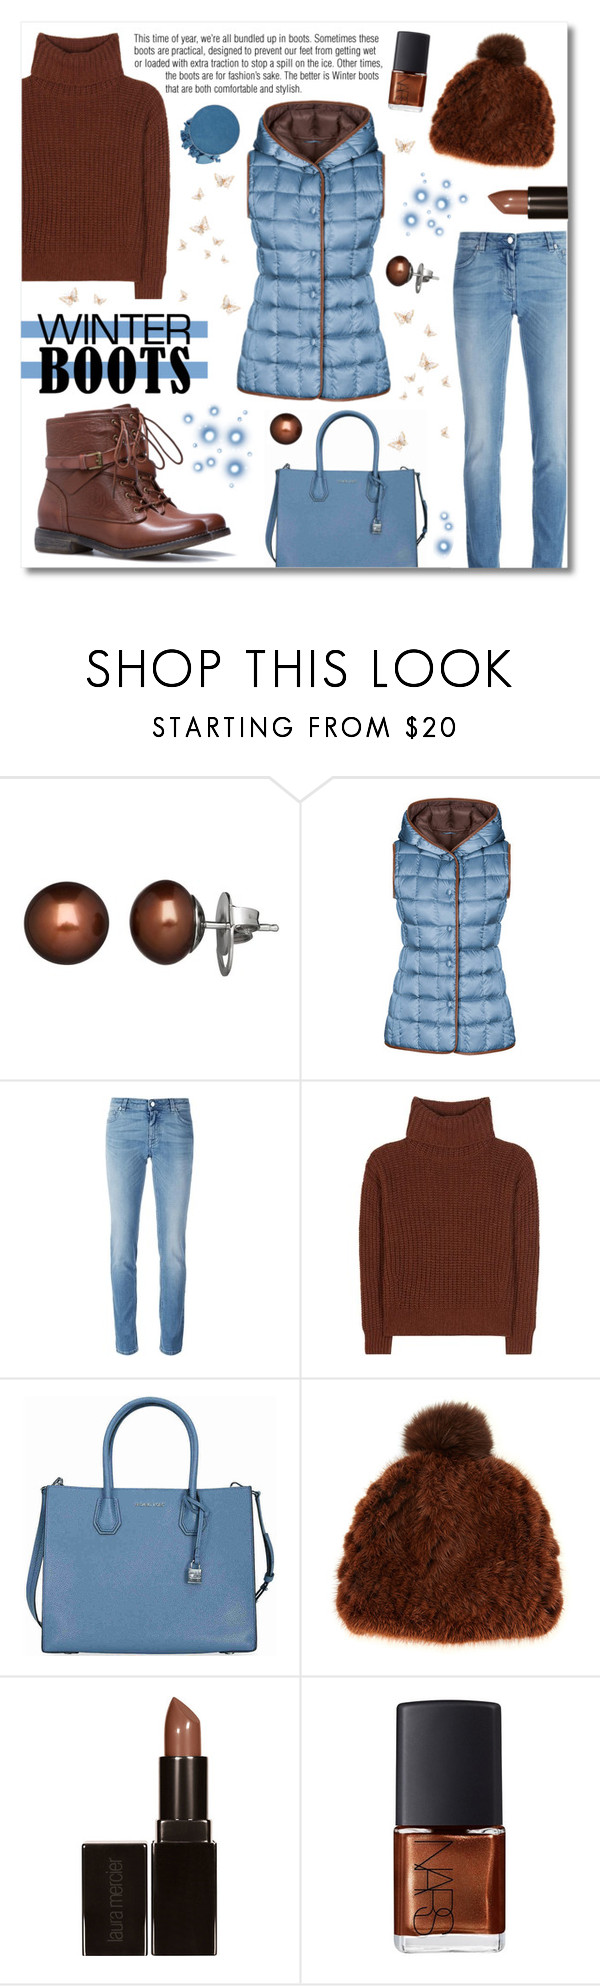 """So Cozy : Winter Boots"" by drinouchou ❤ liked on Polyvore featuring Honora, FAY, Givenchy, Loro Piana, Michael Kors, Pologeorgis, Laura Mercier, NARS Cosmetics and winterboots"